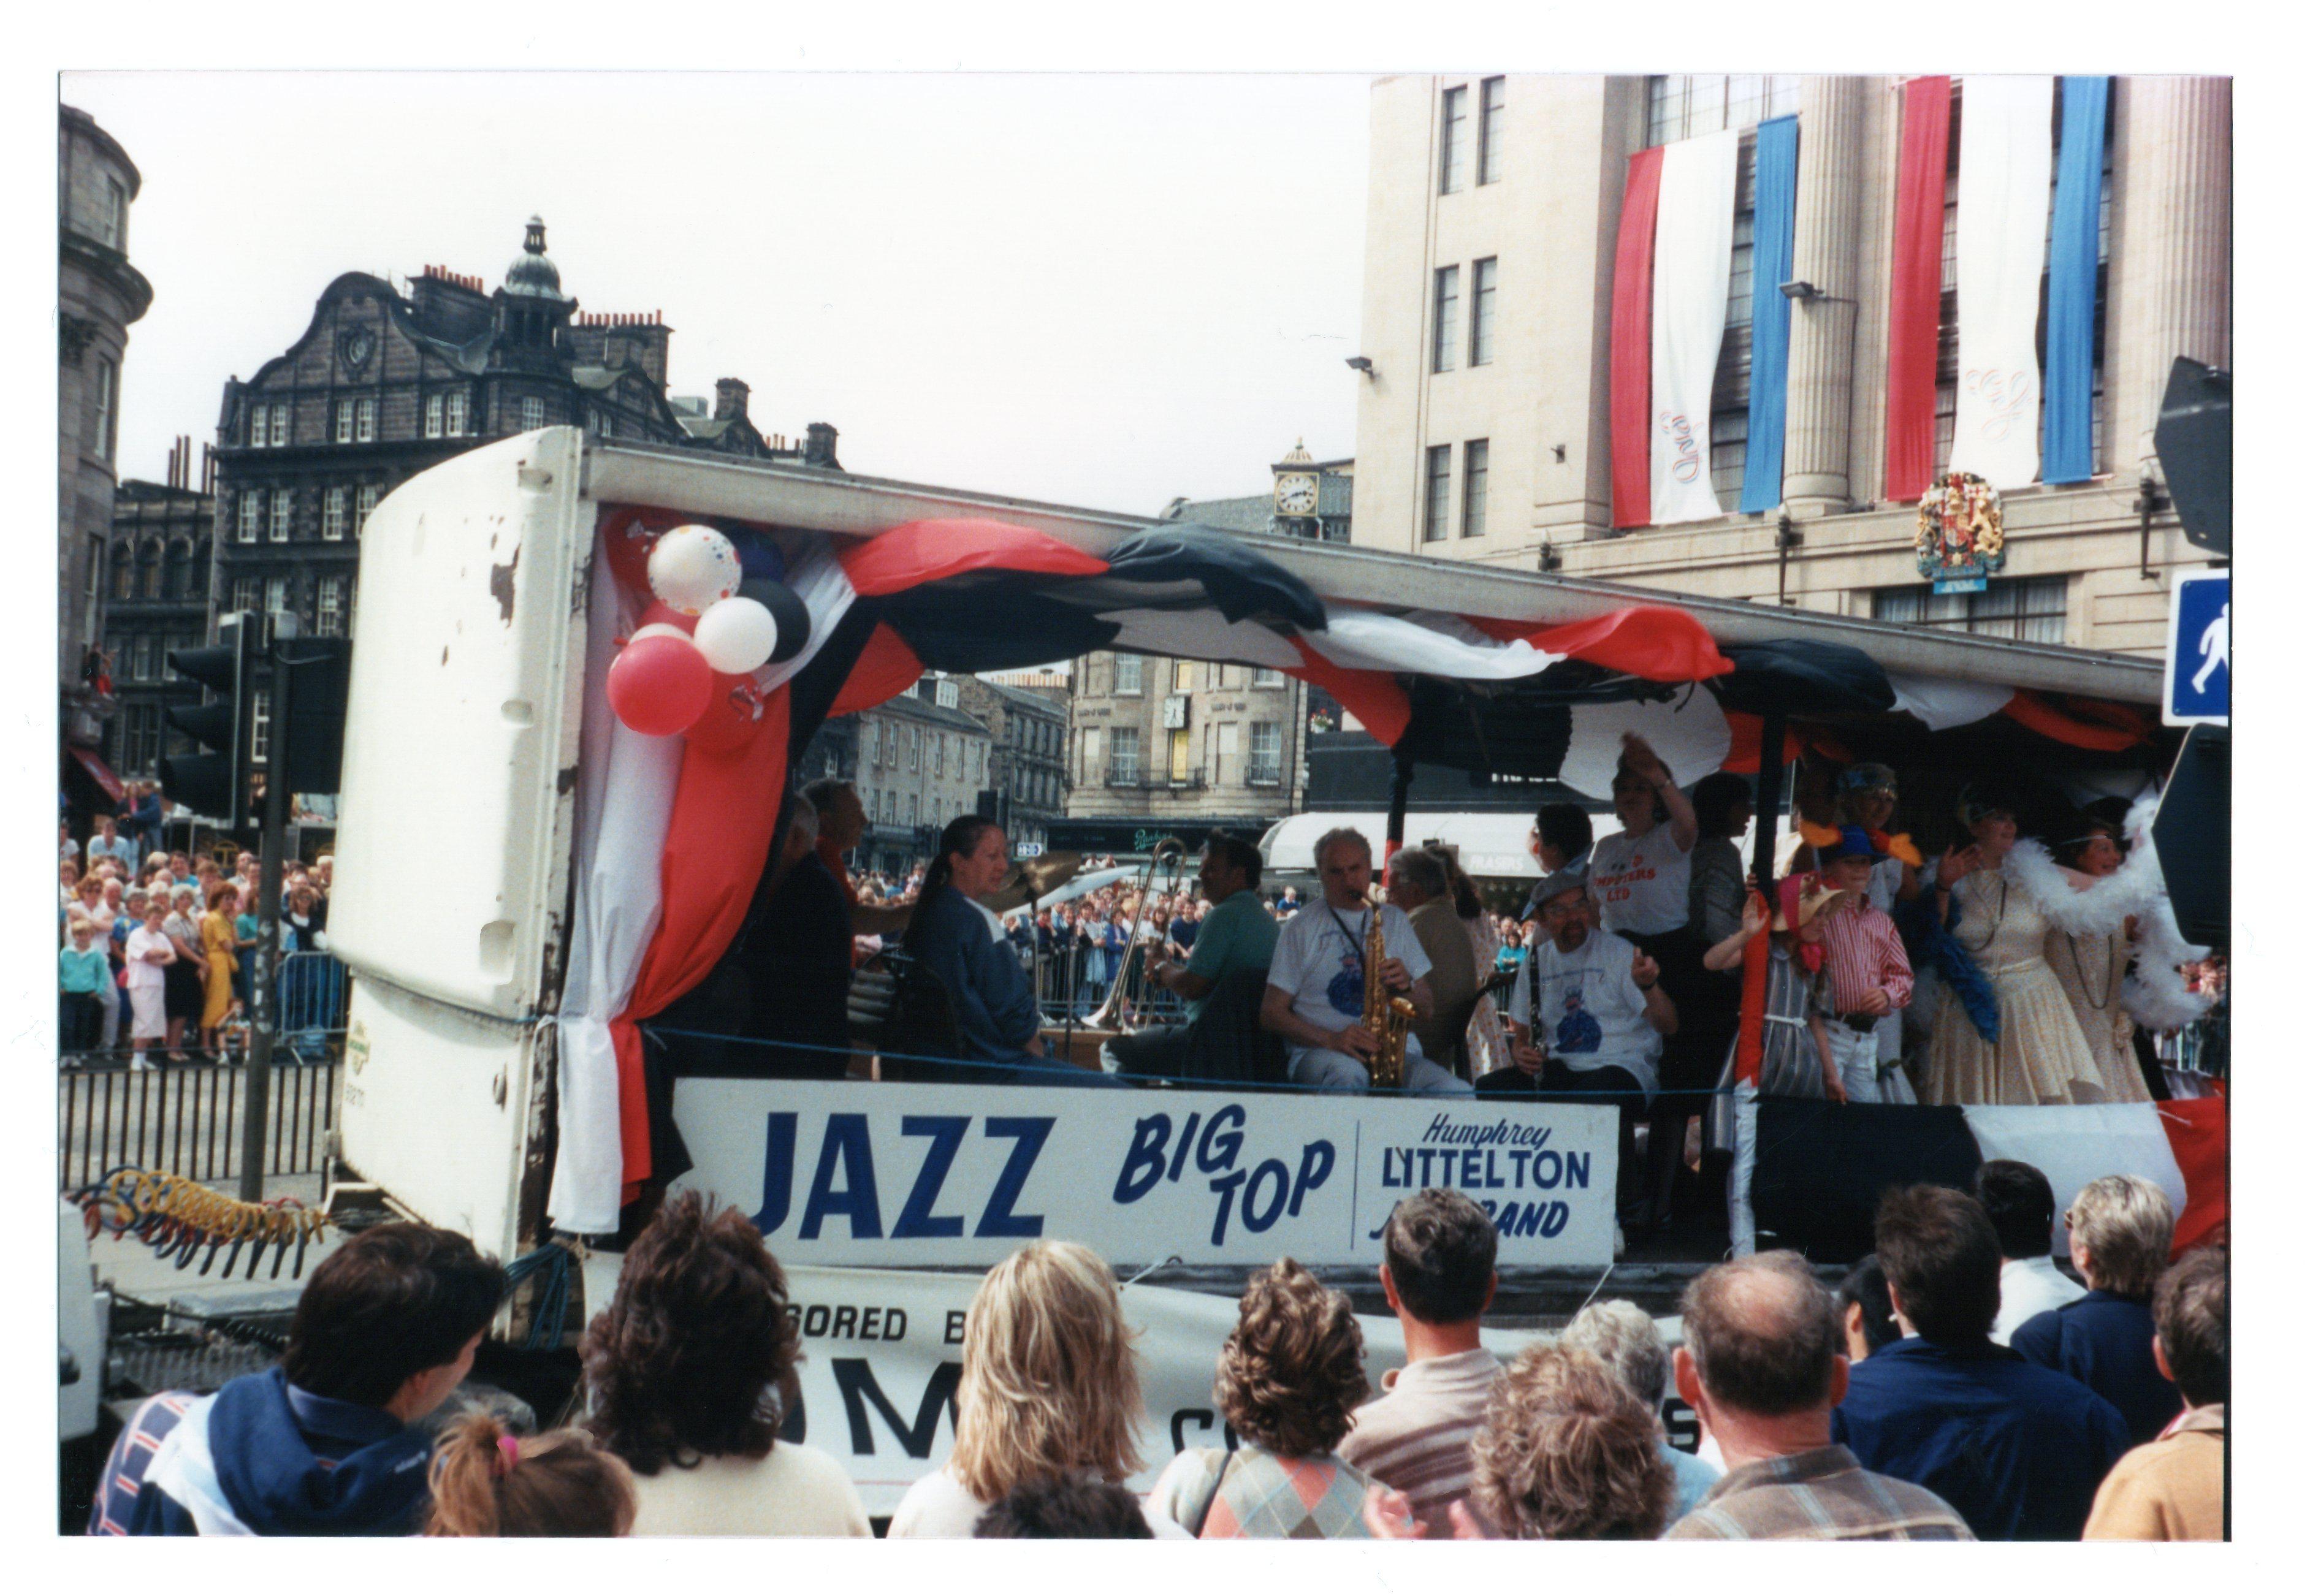 Jazz Big Top - Humphrey Littlelton Band Jazz Festival Parade 1987